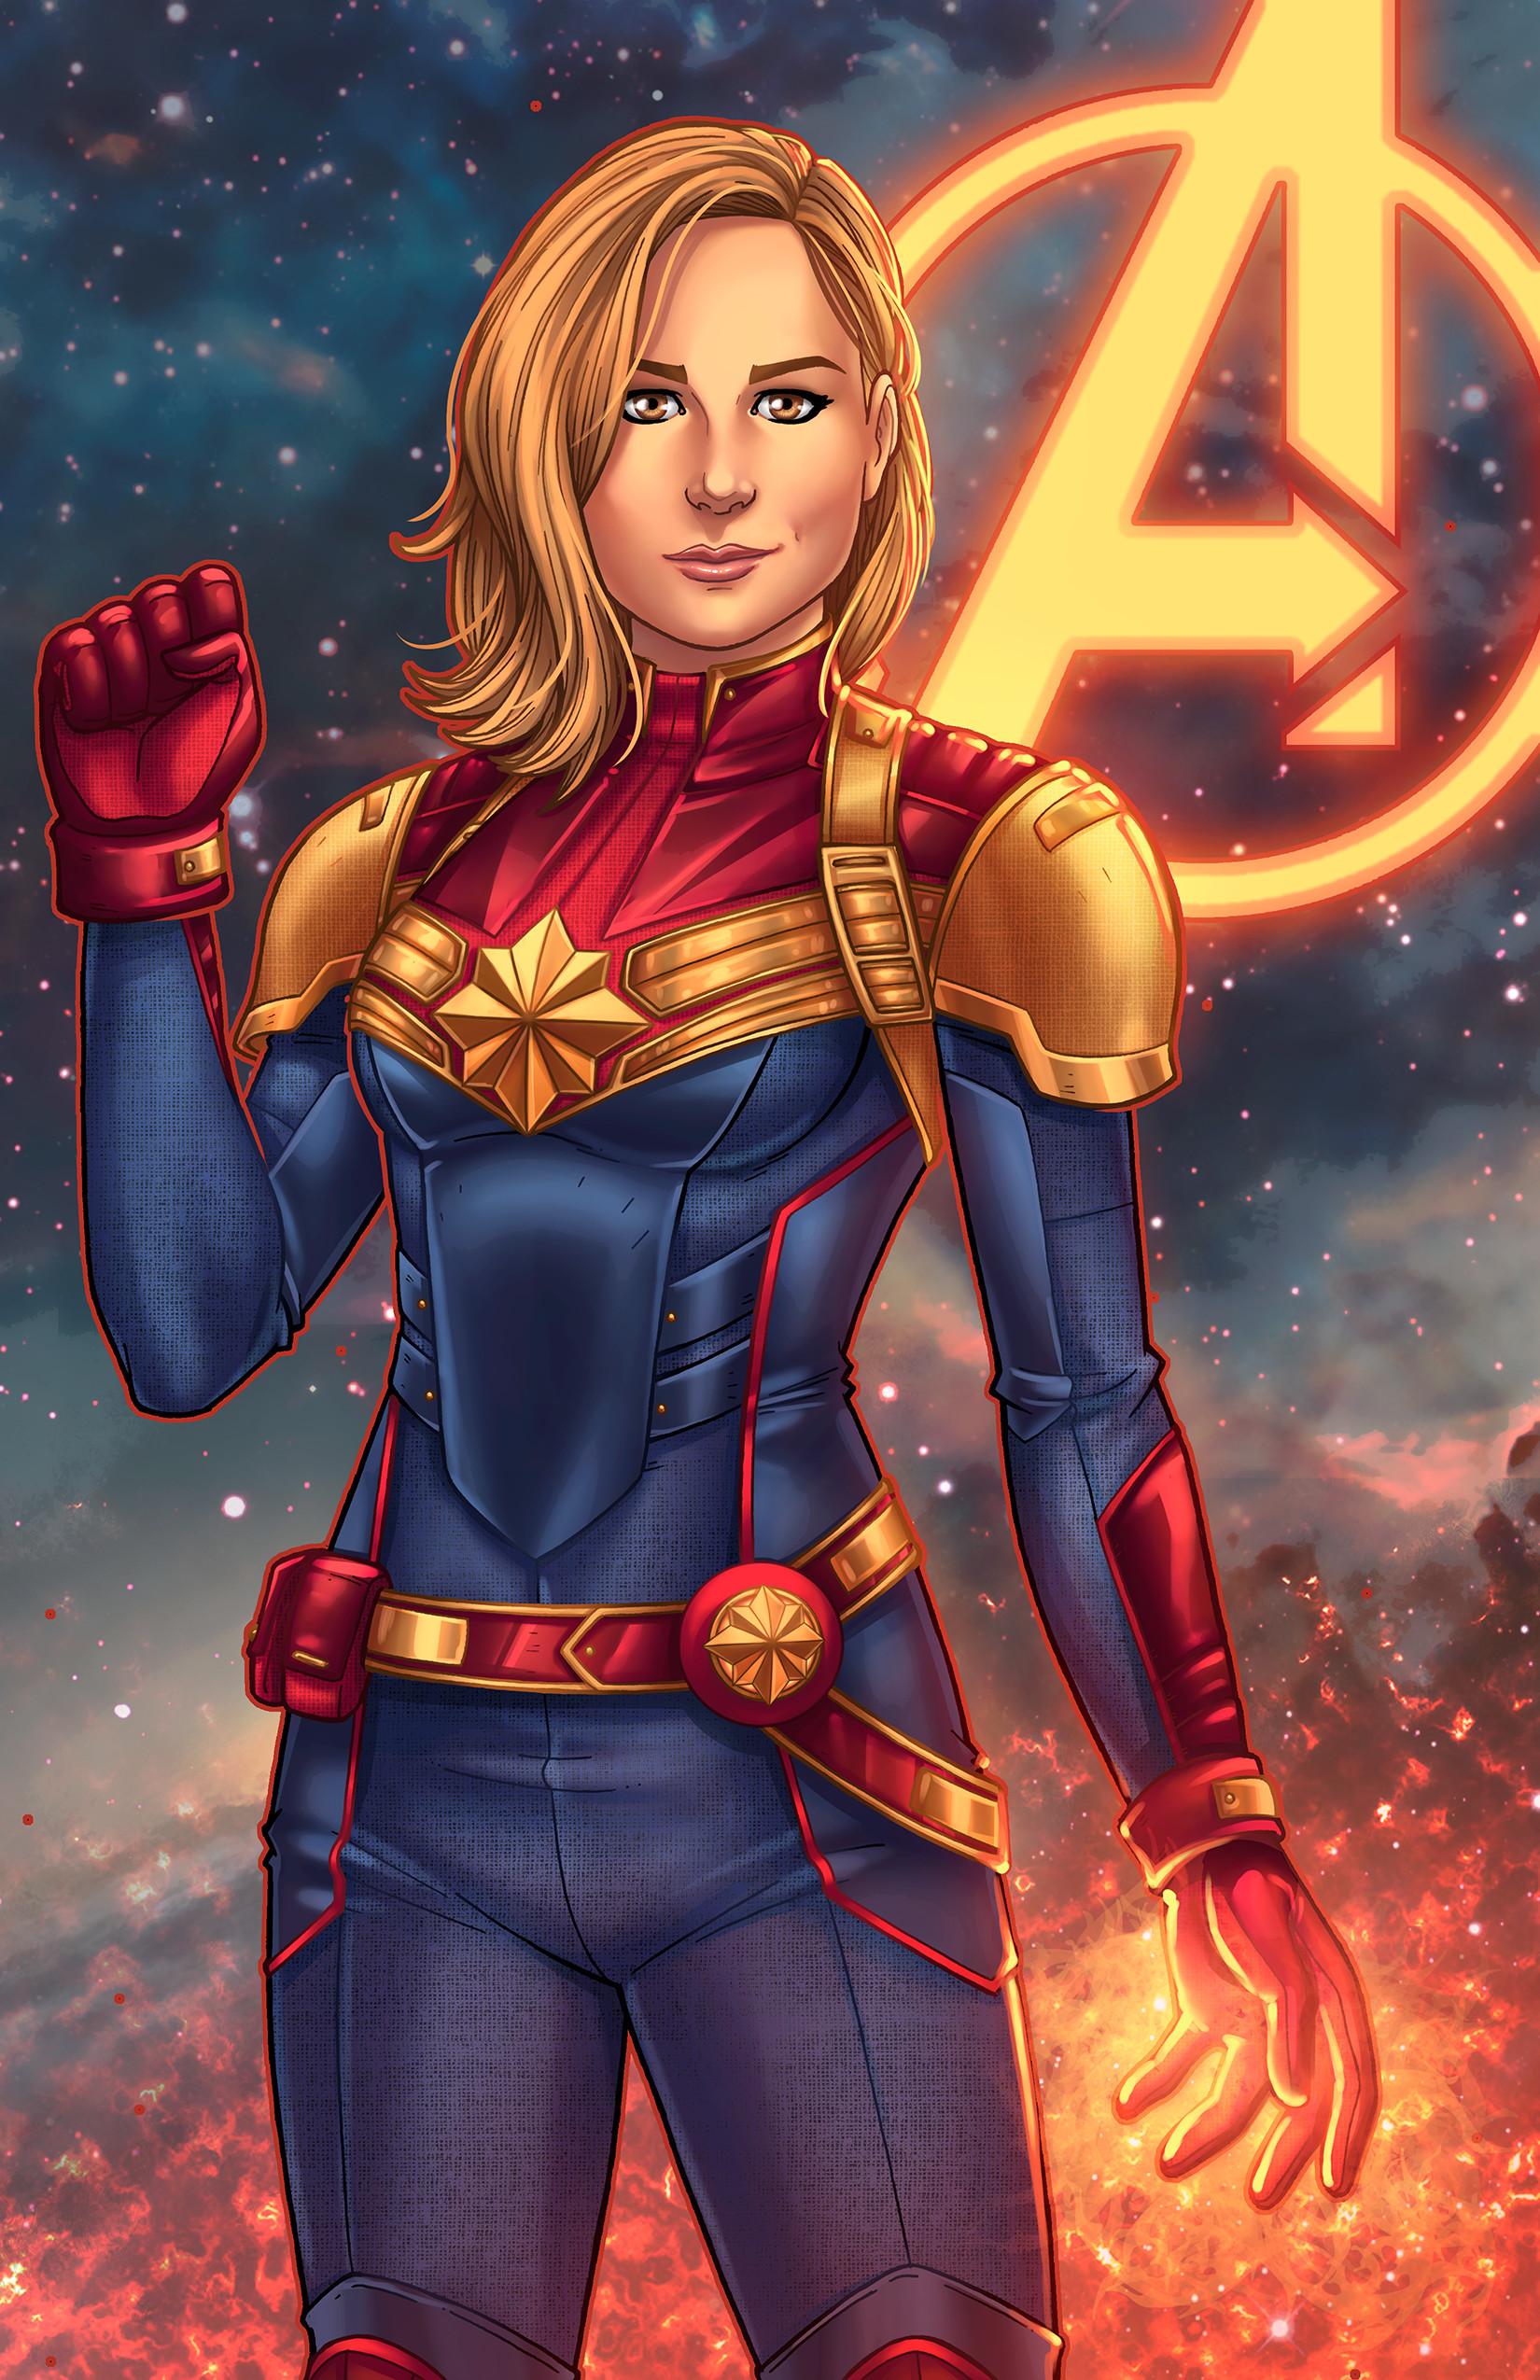 Captain Marvel Wallpaper (60+ images)